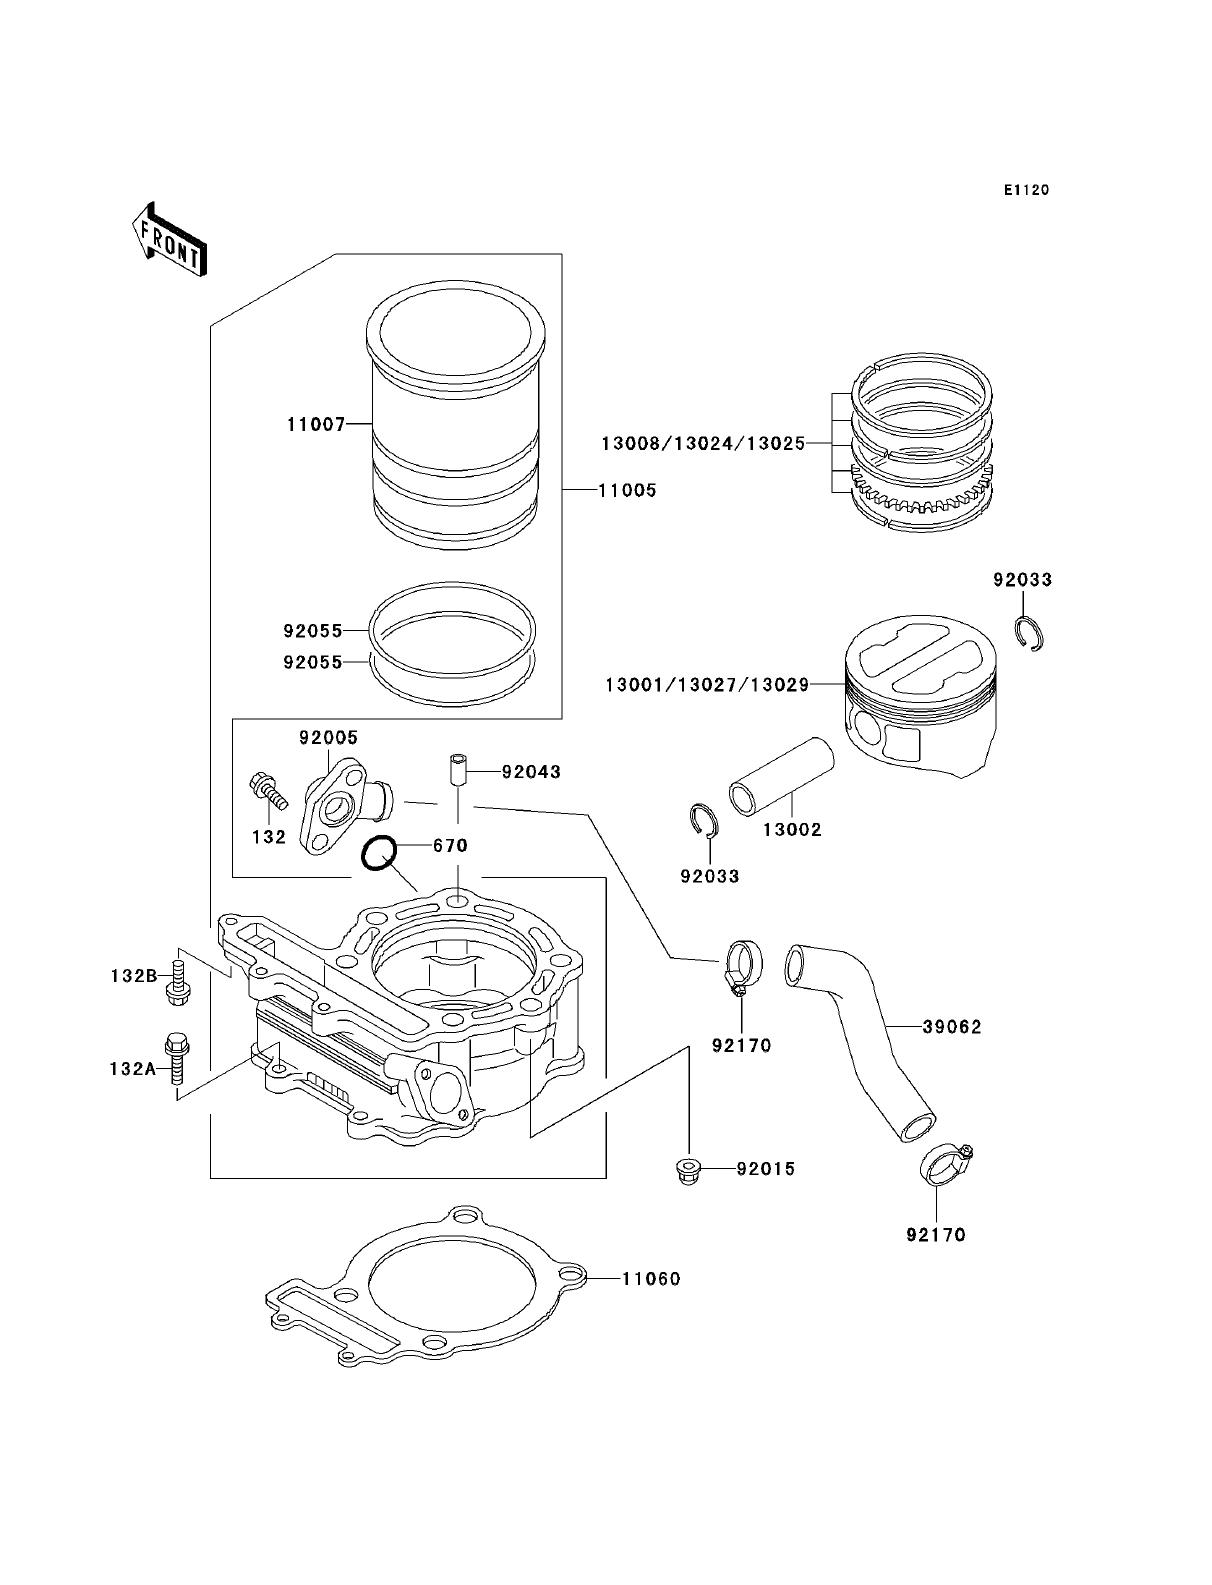 Wiring Diagram For Klr 250